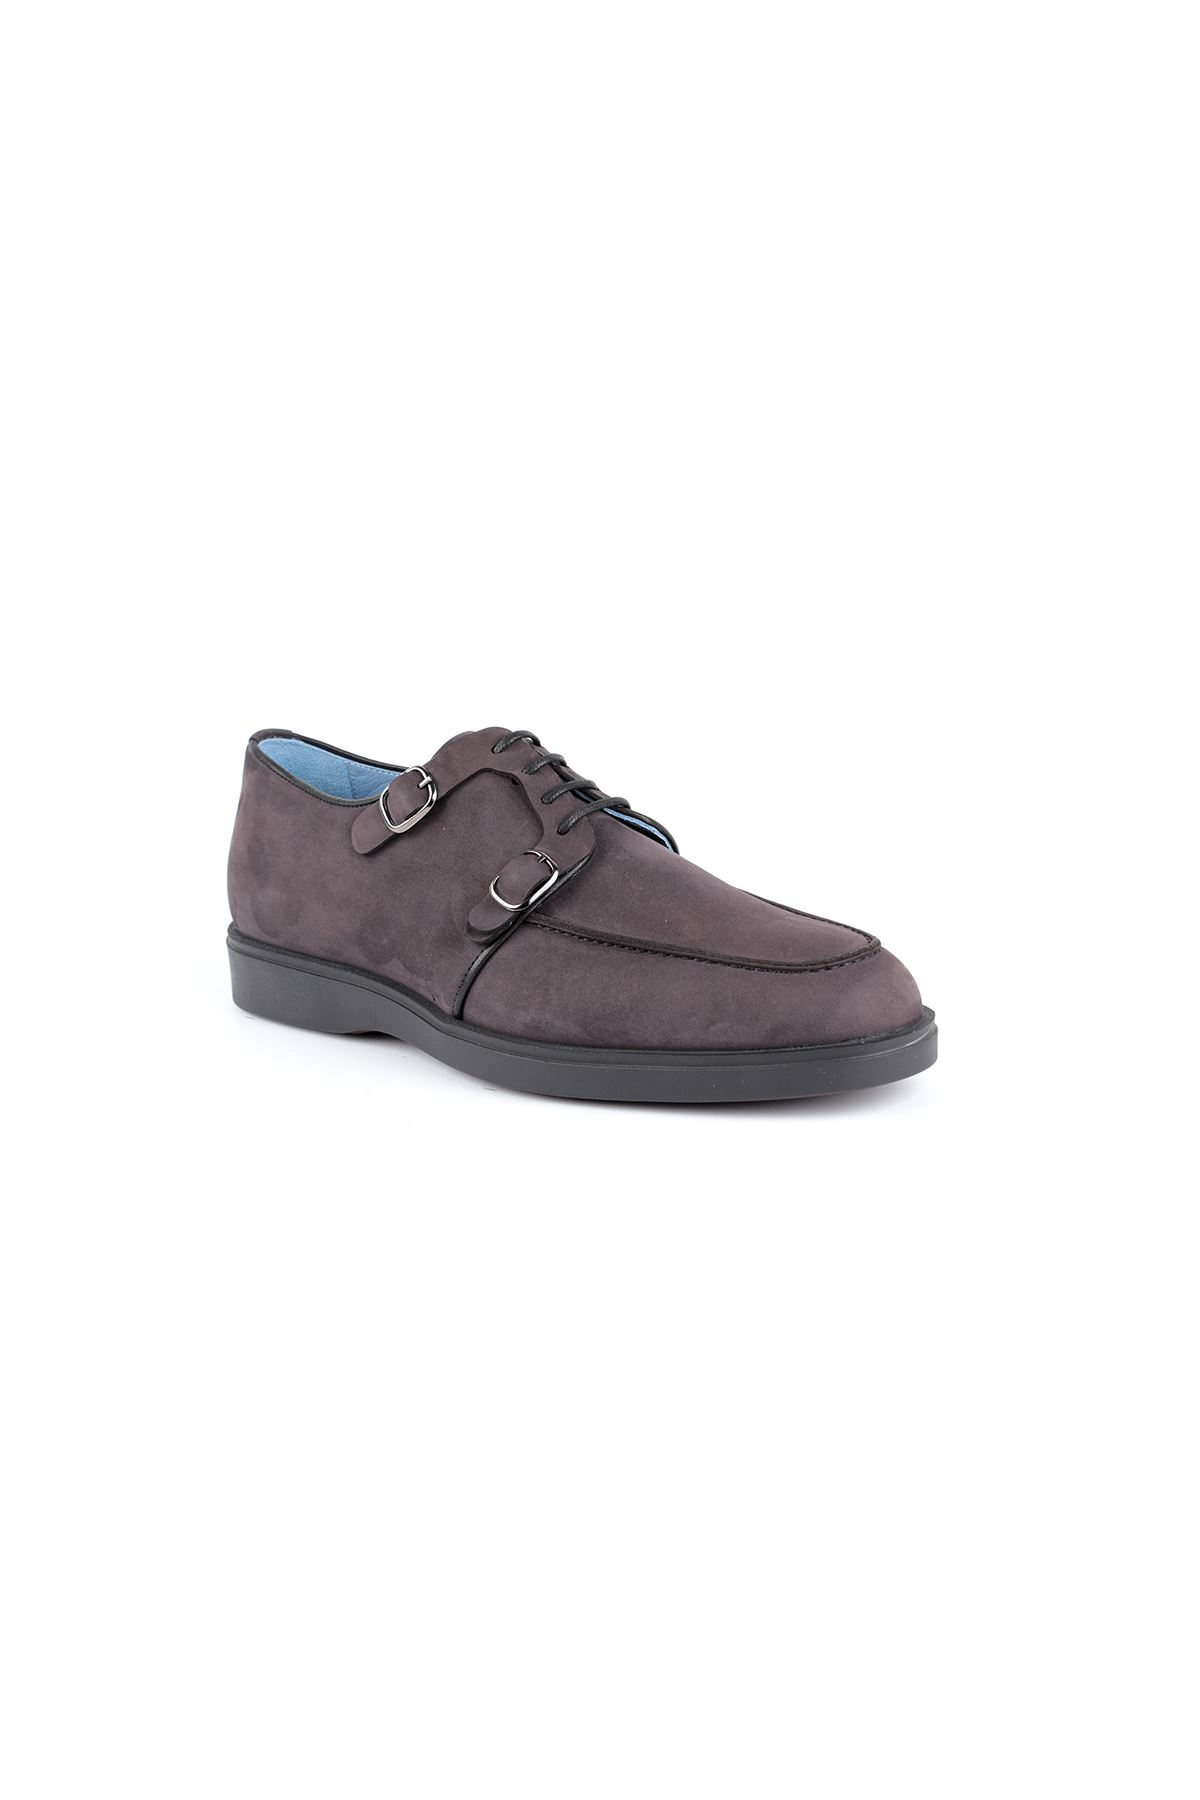 Libero L3756 Anthracite Casual Men Shoes